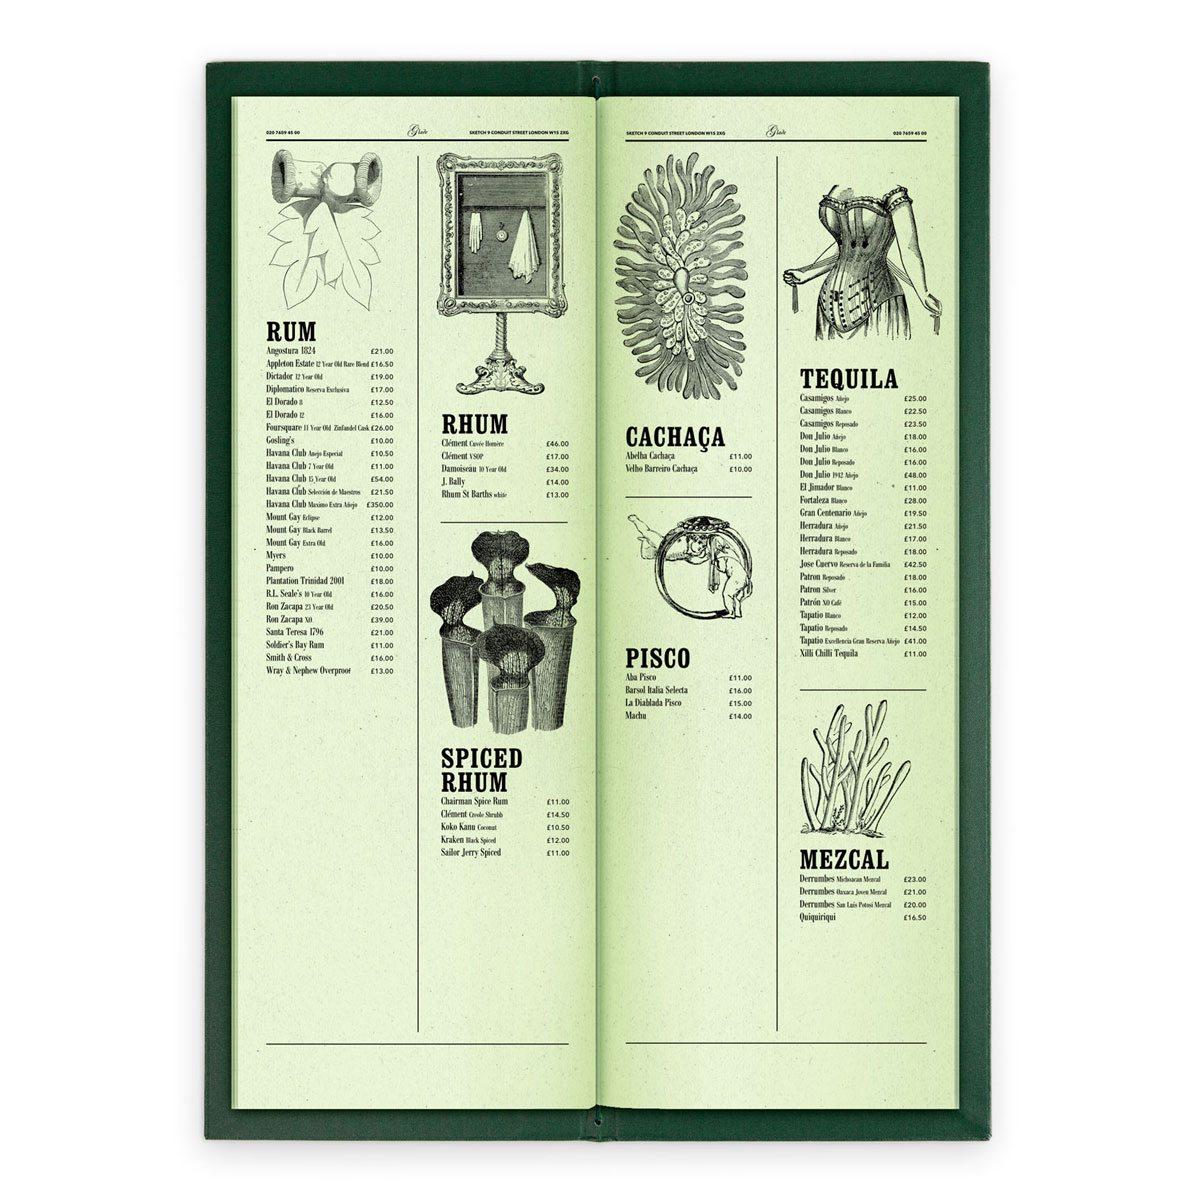 sketch london wine list glade green gravures anciennes engraving vintage punk forest exotic spirits